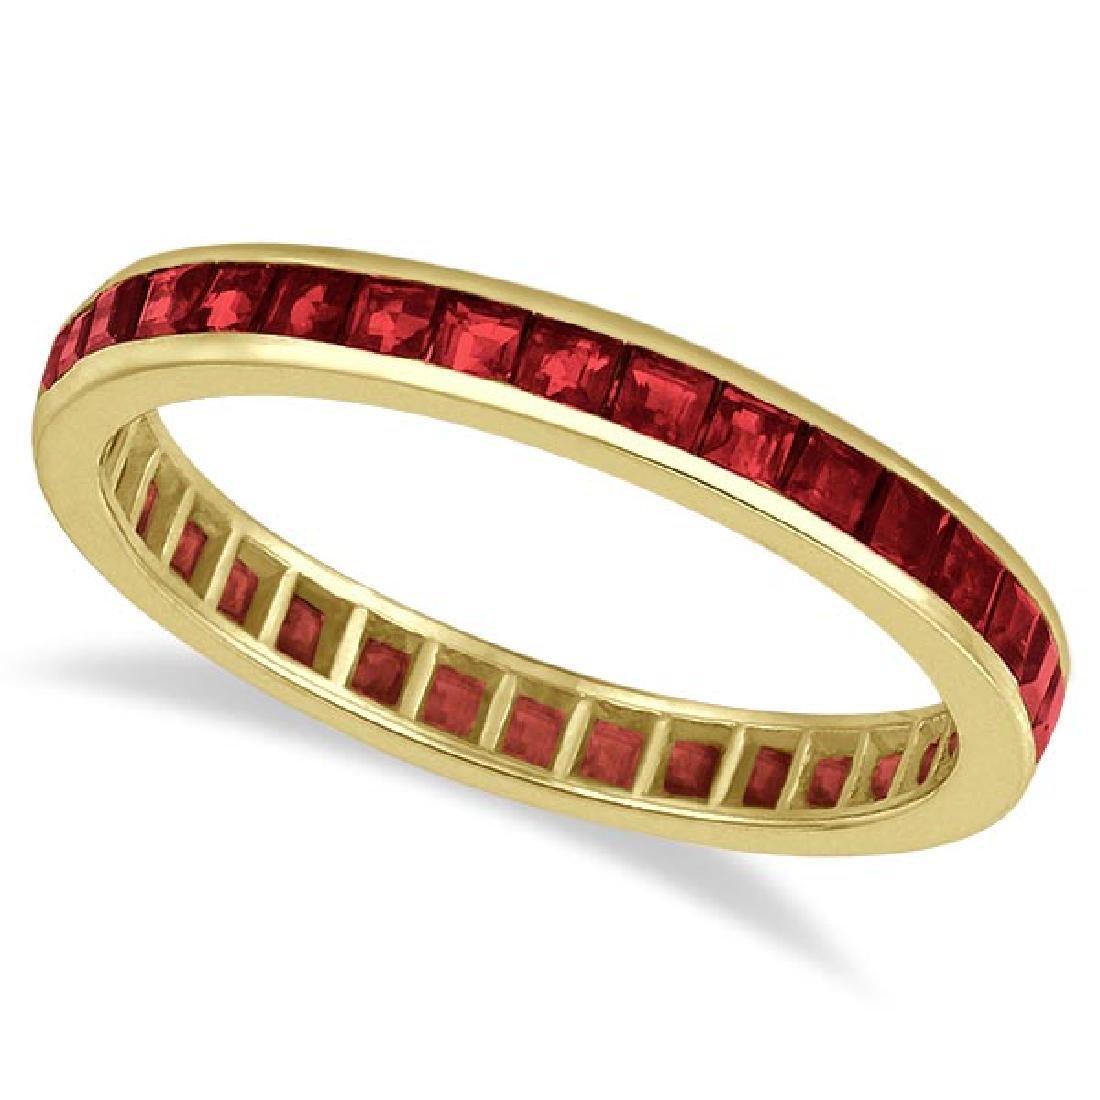 Princess-Cut Garnet Eternity Ring Band 14k Yellow Gold